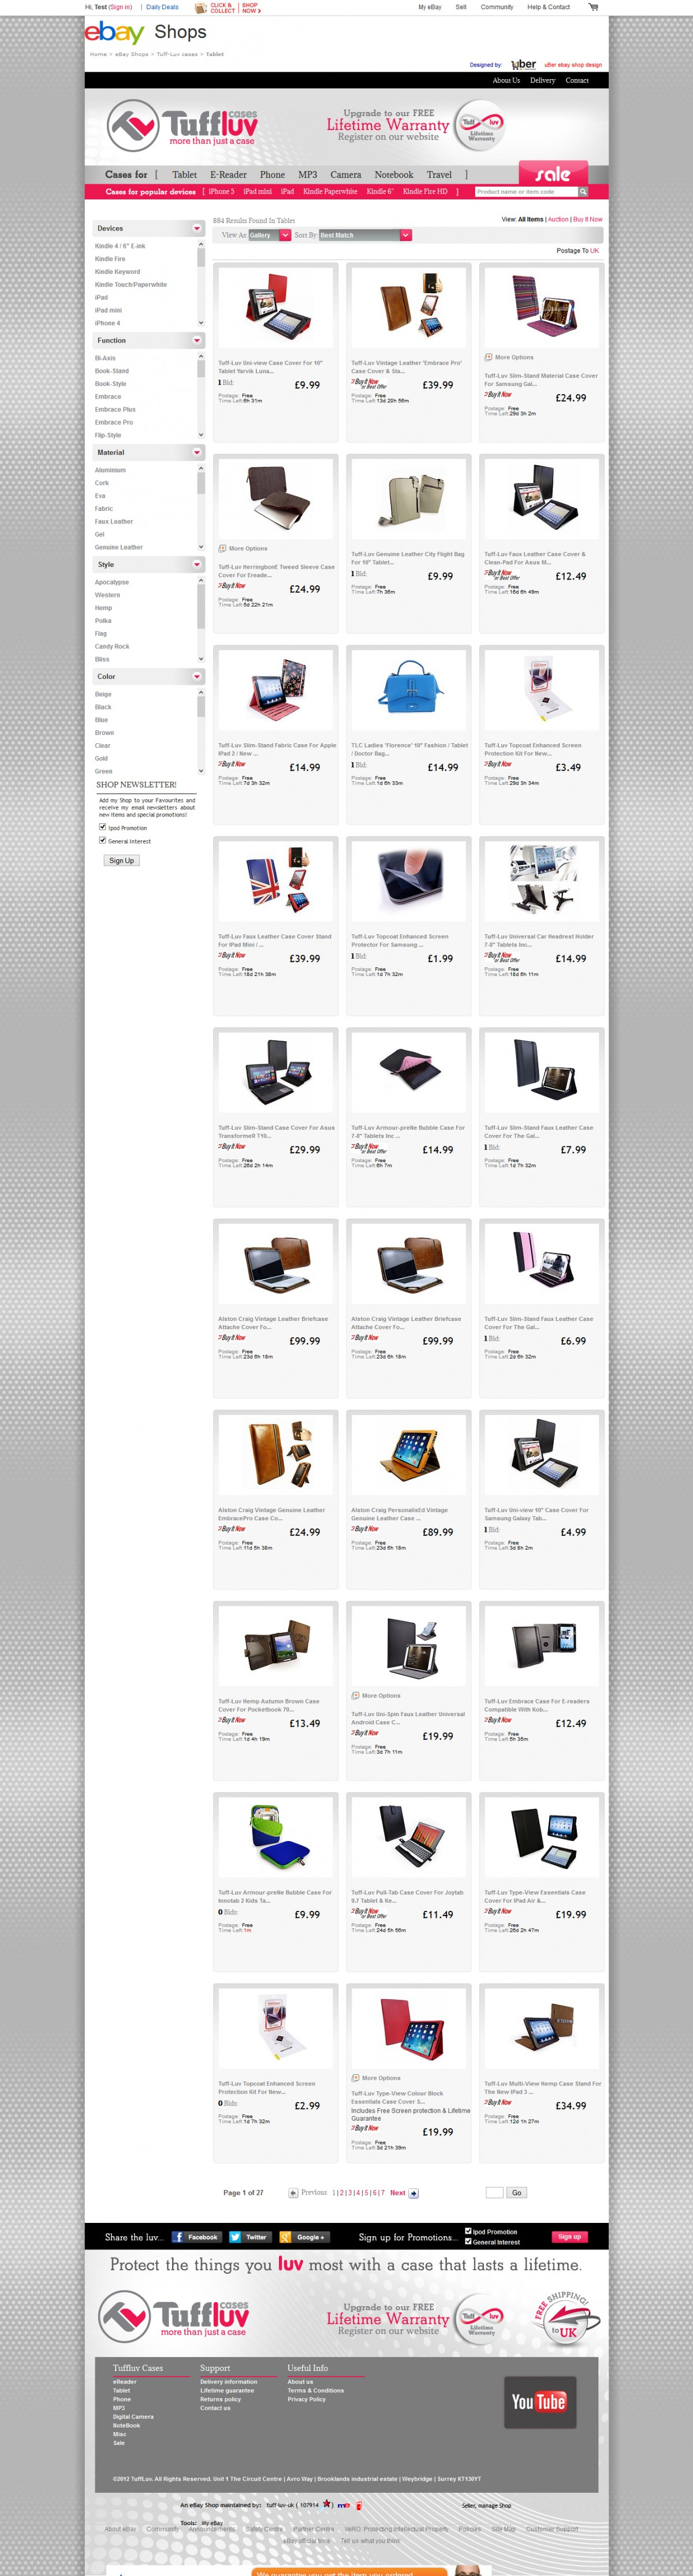 Tuff-Luv Category view ebay shop design